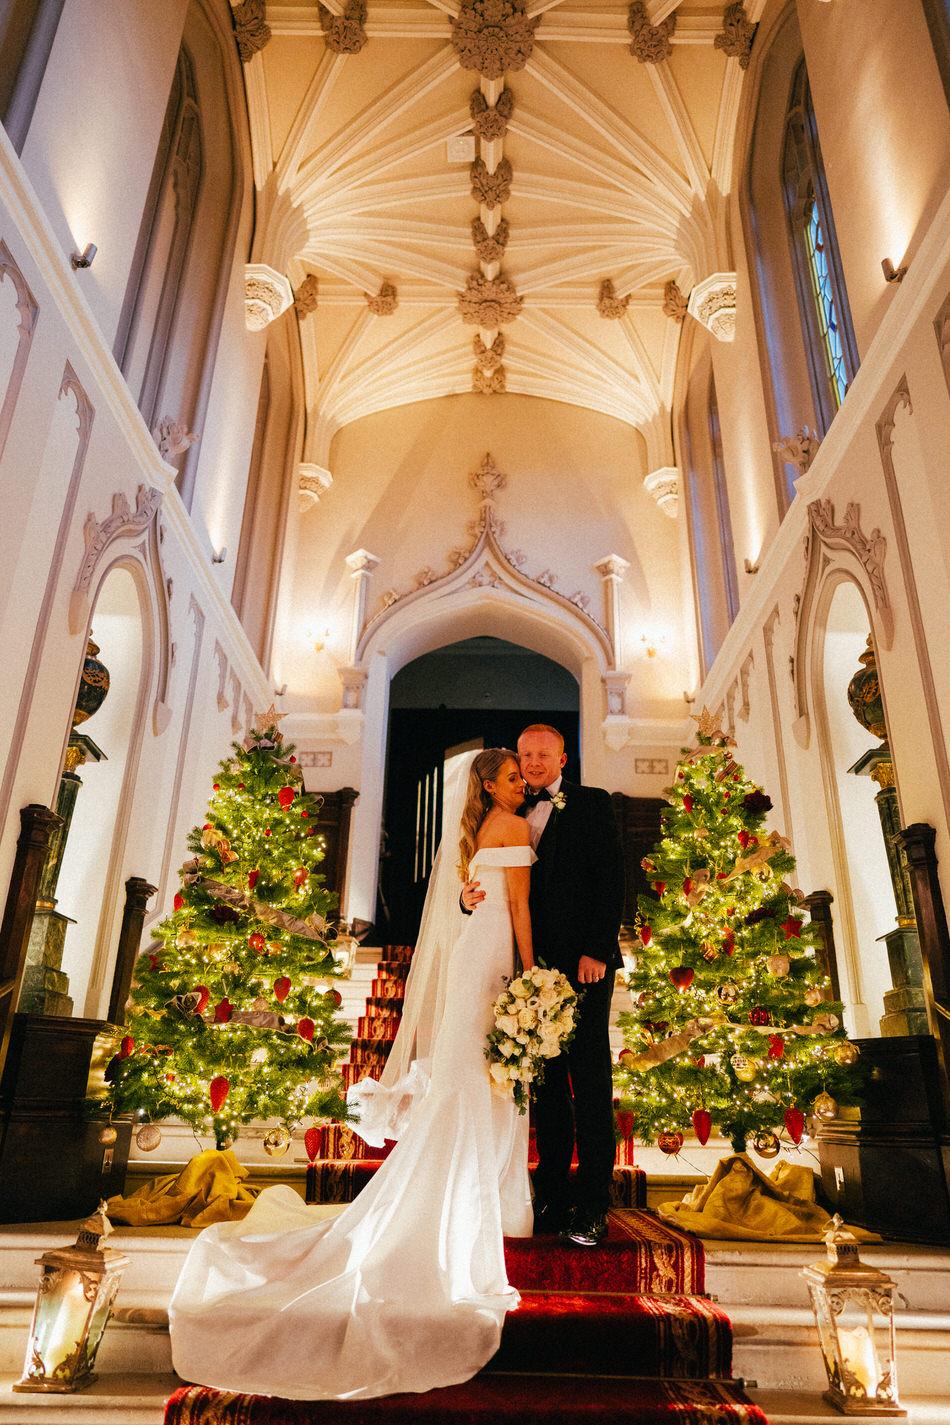 Castle-wedding-ireland-photos- 0250 188